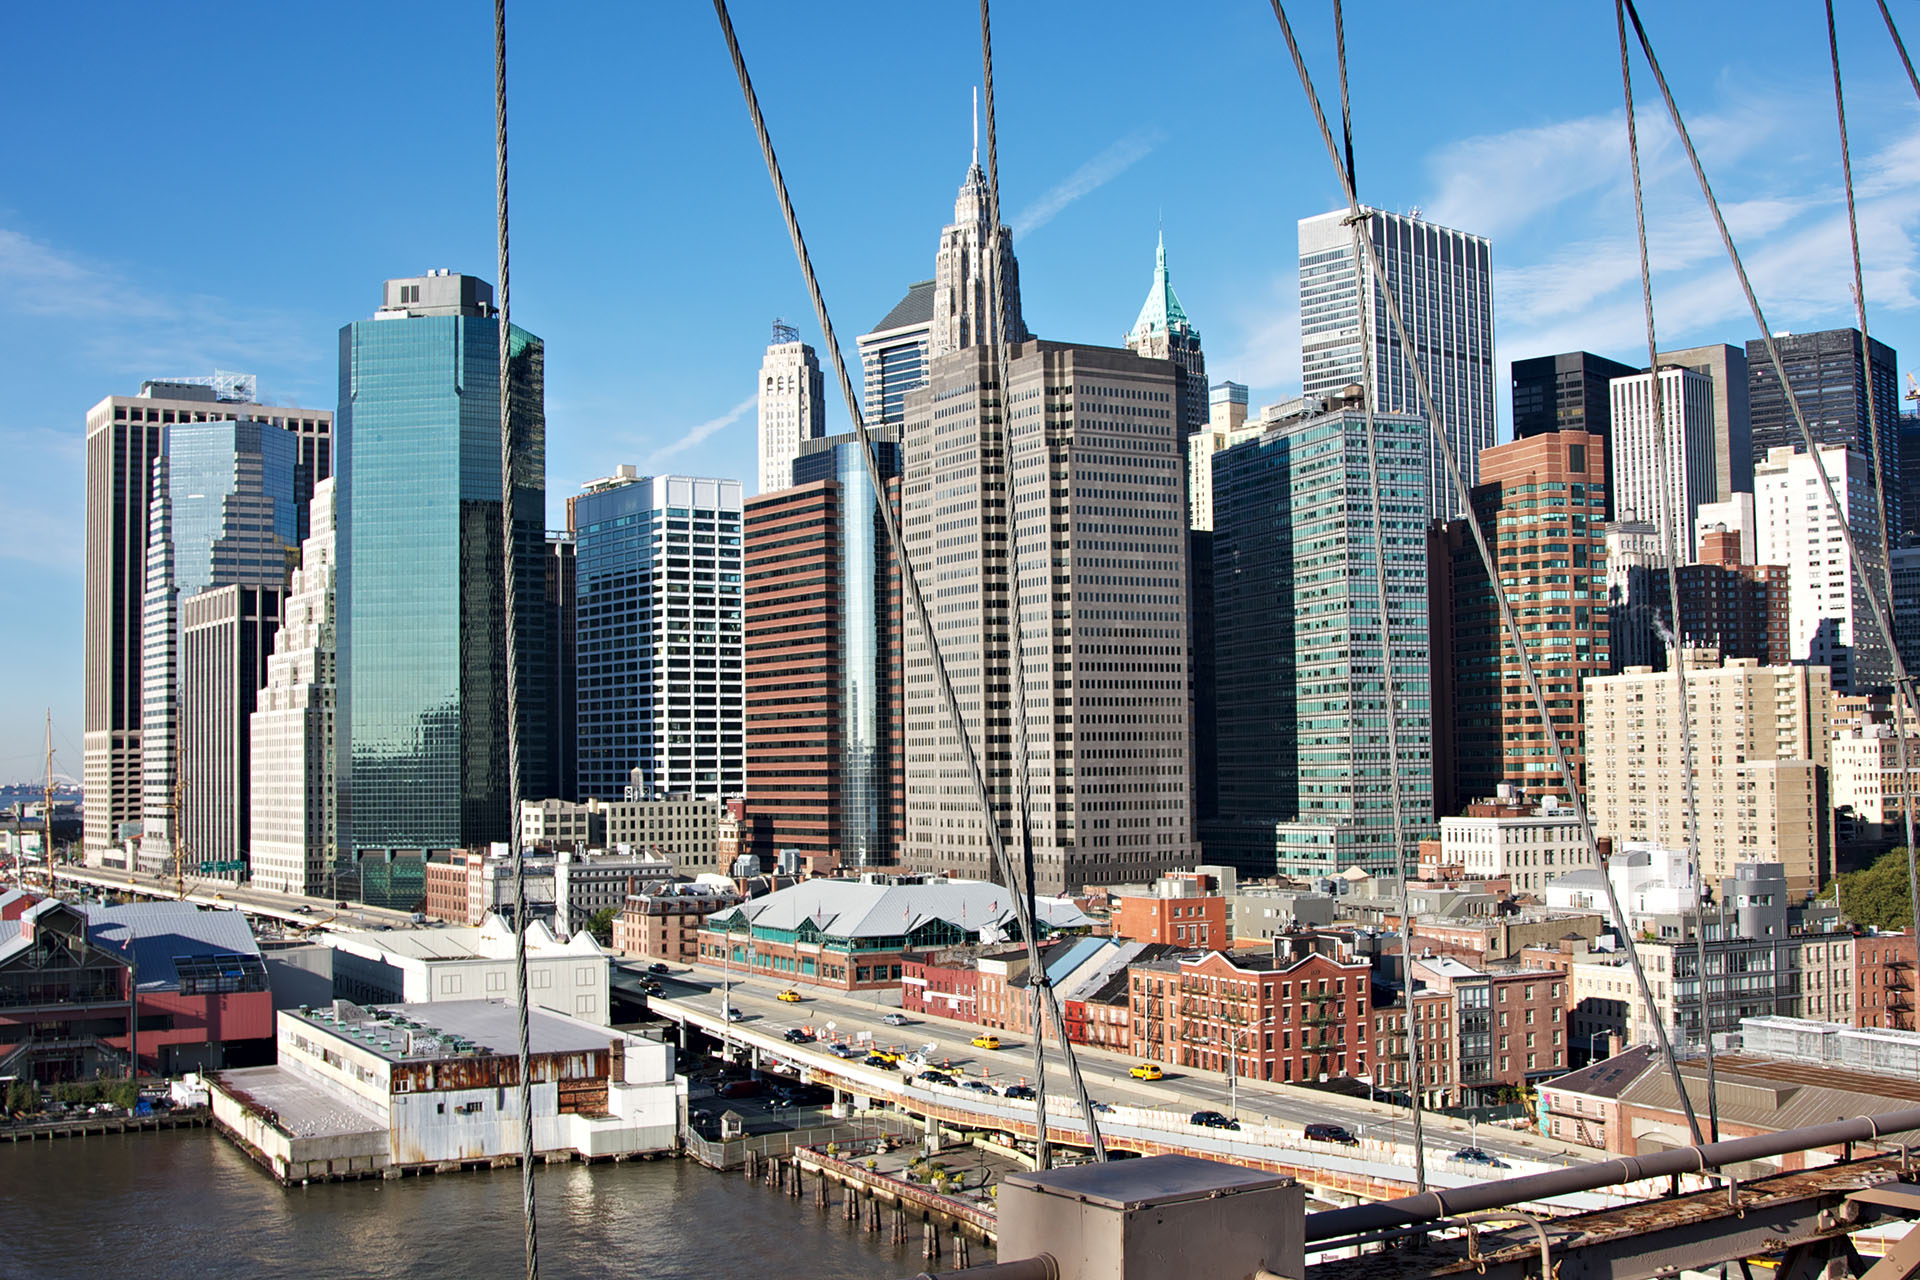 20111028 New York 94